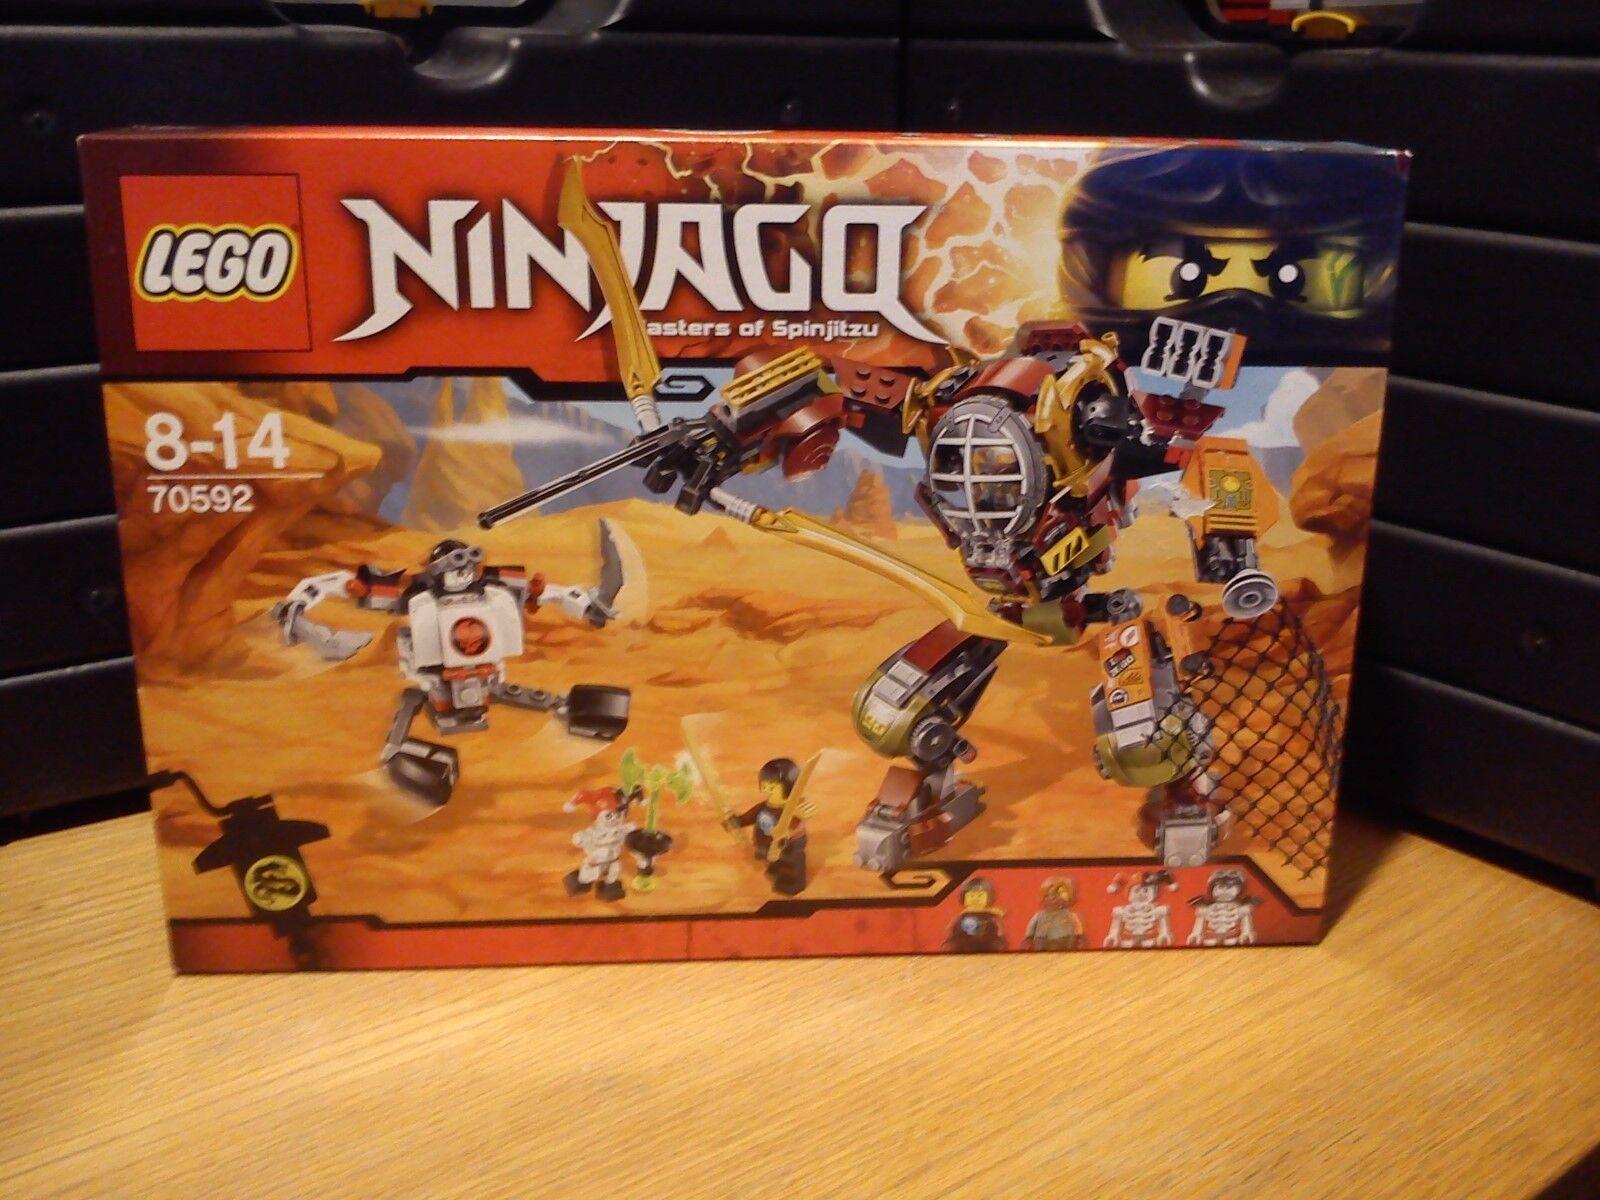 Lego Ninjago 70592 Le robot de Ronin (New & Sealed)